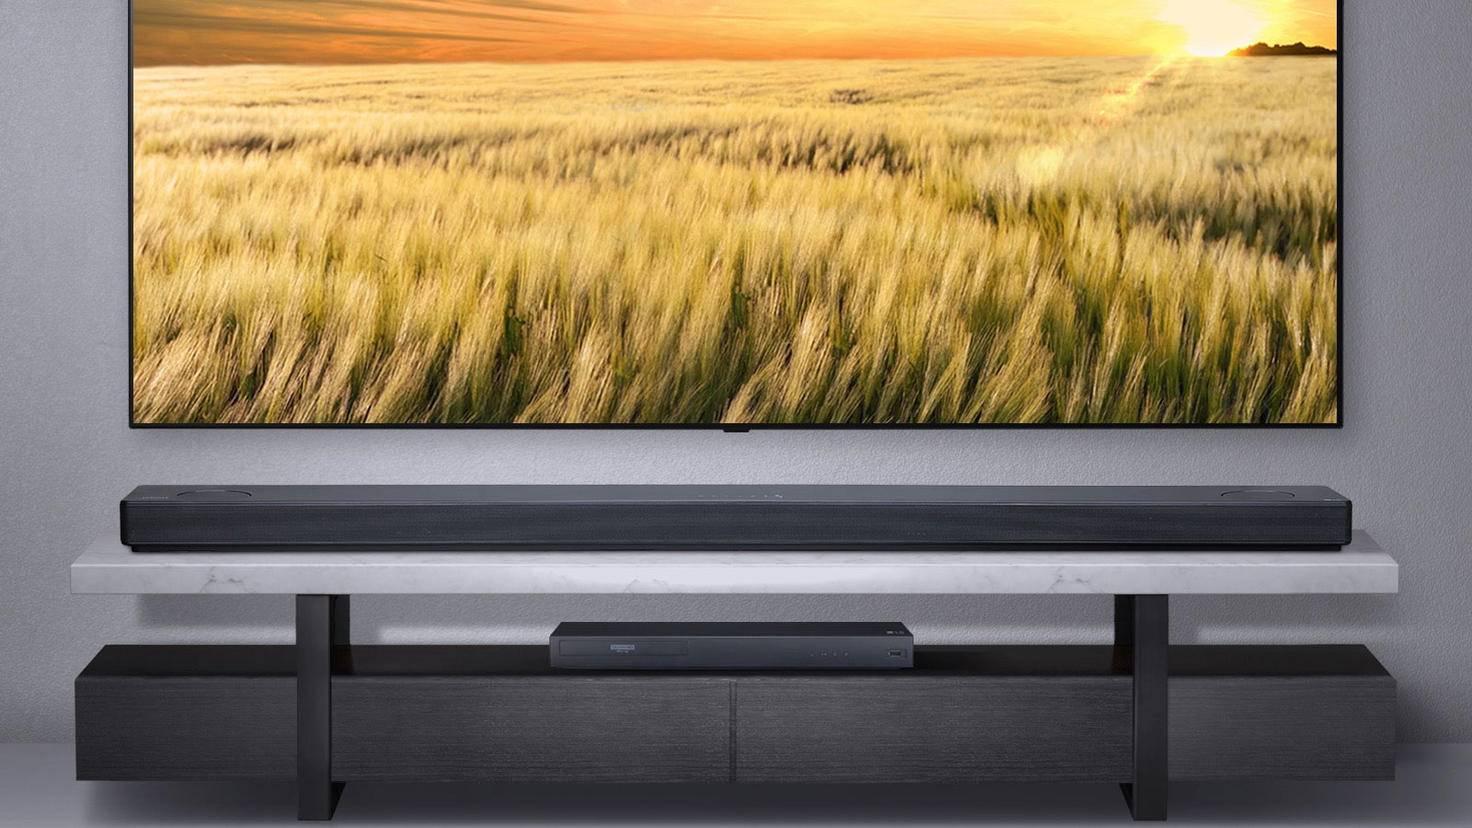 5.1-Soundbar LG SL10YG